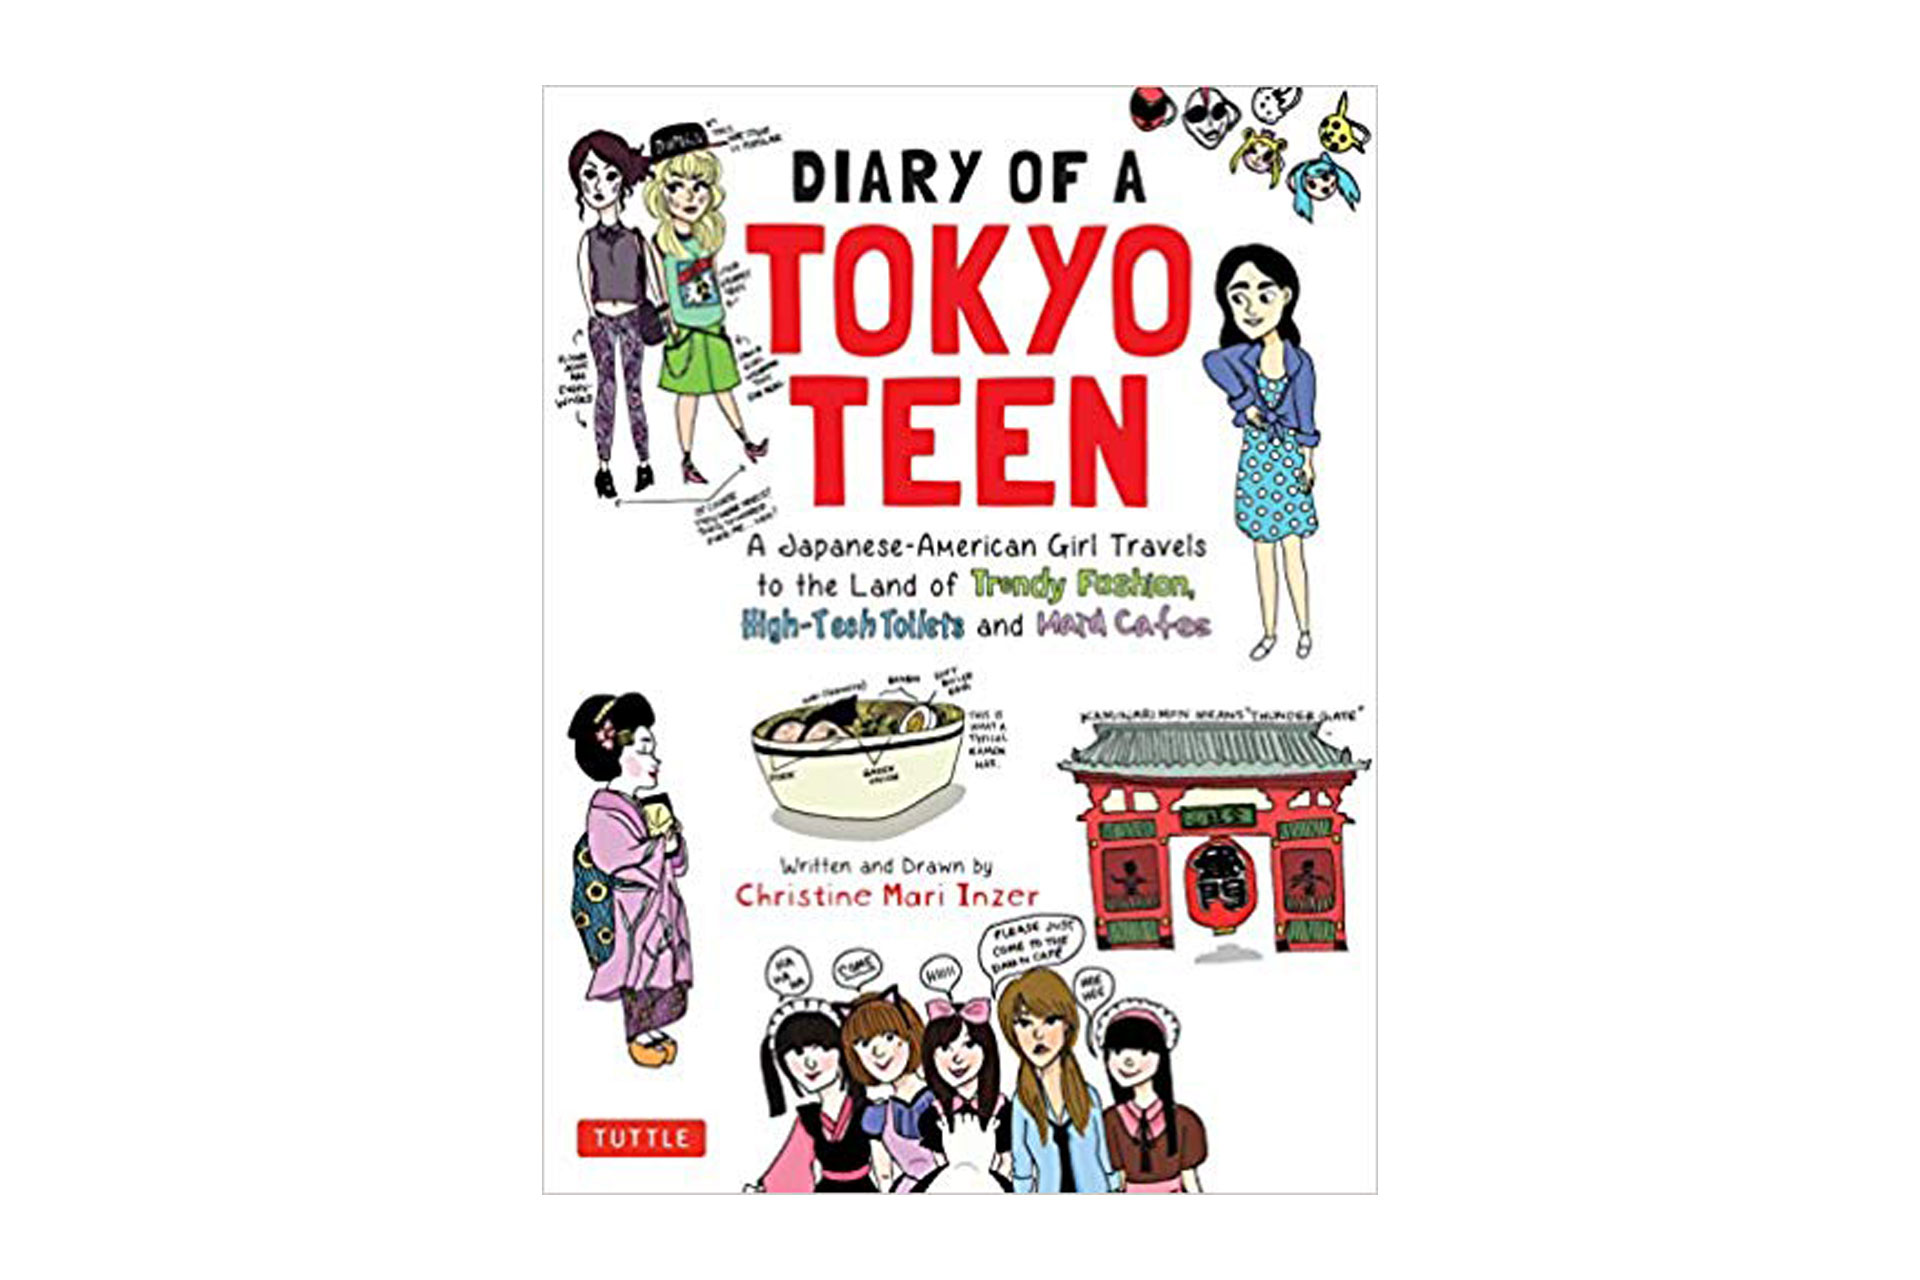 Diary Of a Tokyo Teen Book; Courtesy of Amazon